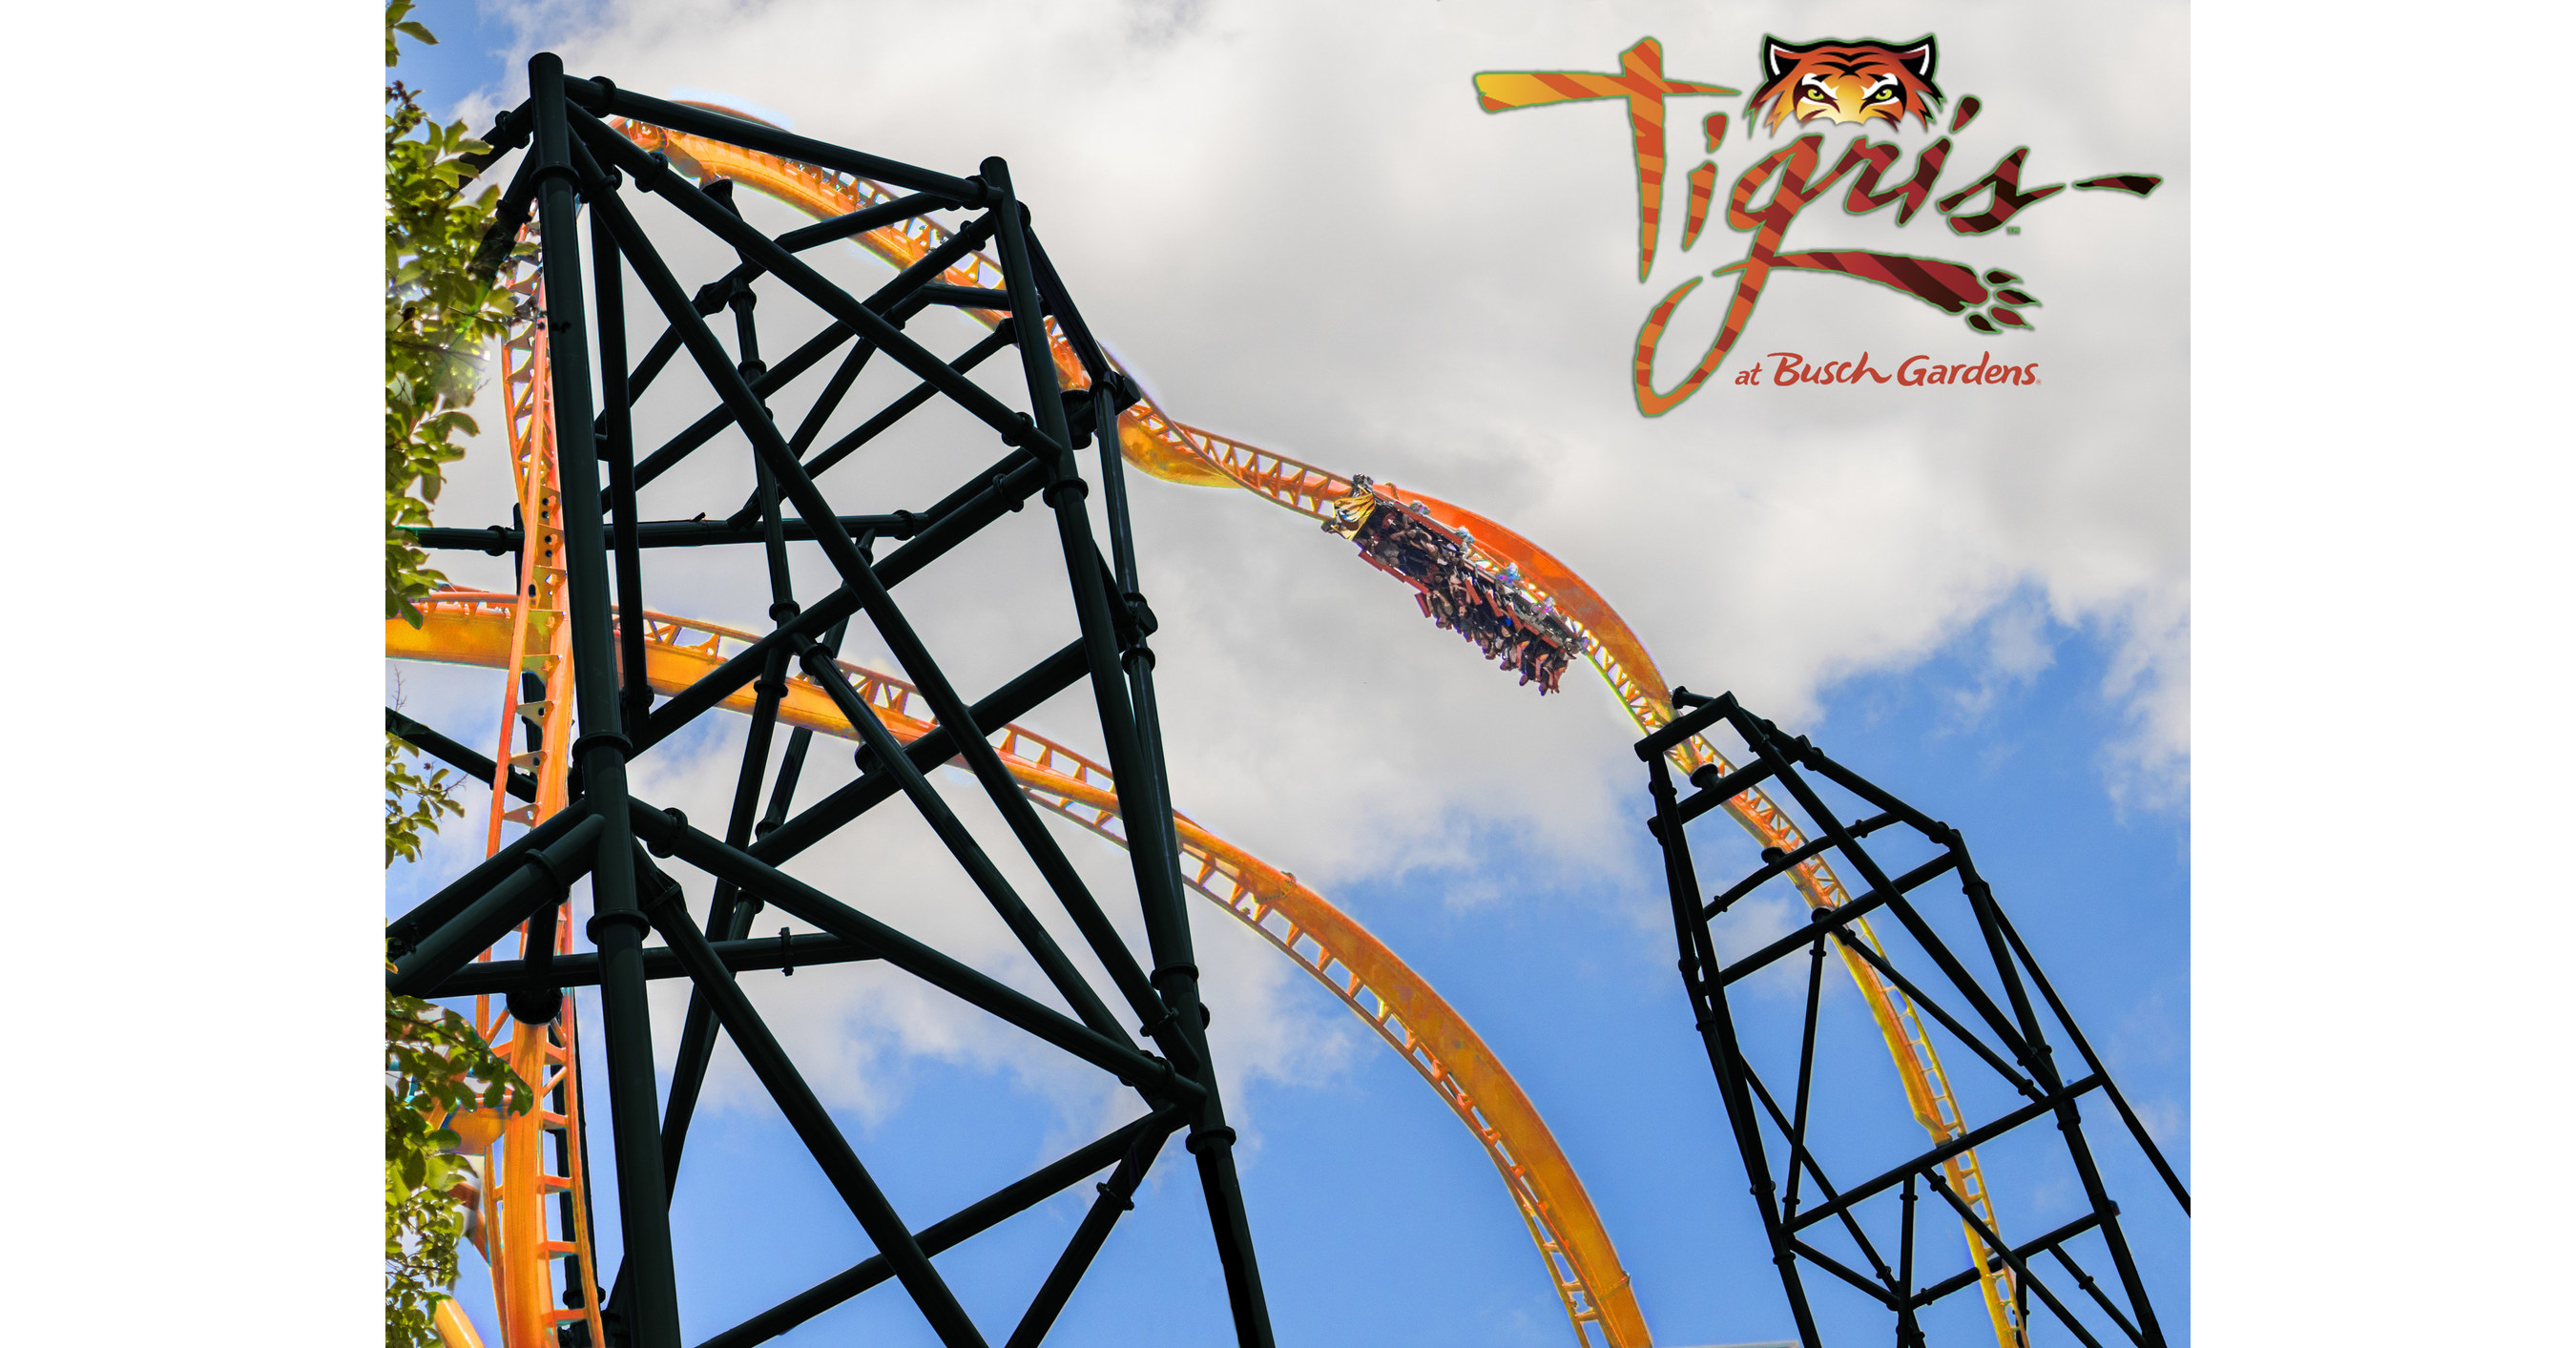 Busch Gardens Tampa Bay Announces New Multi-Launch Thrill